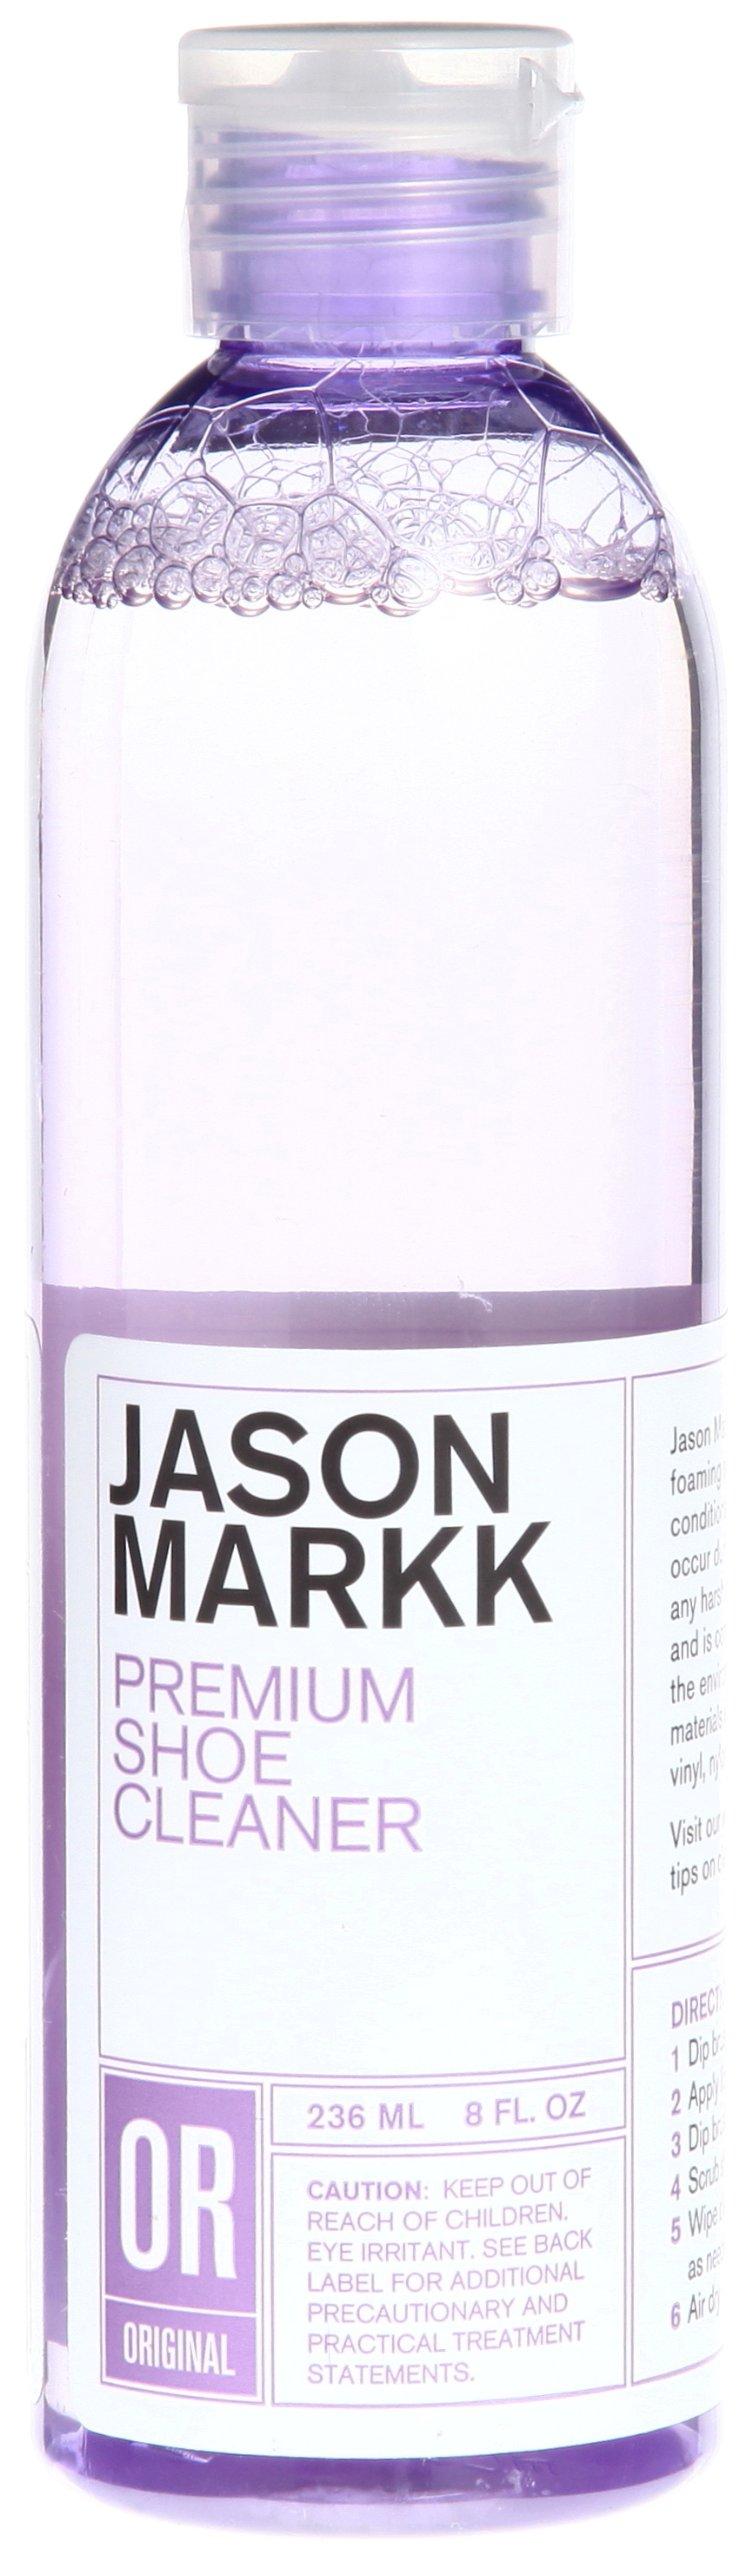 Jason Markk Premium Shoe Cleaner 8 Fl Oz, No Color, Size No Size 7Mxz by Jason Markk